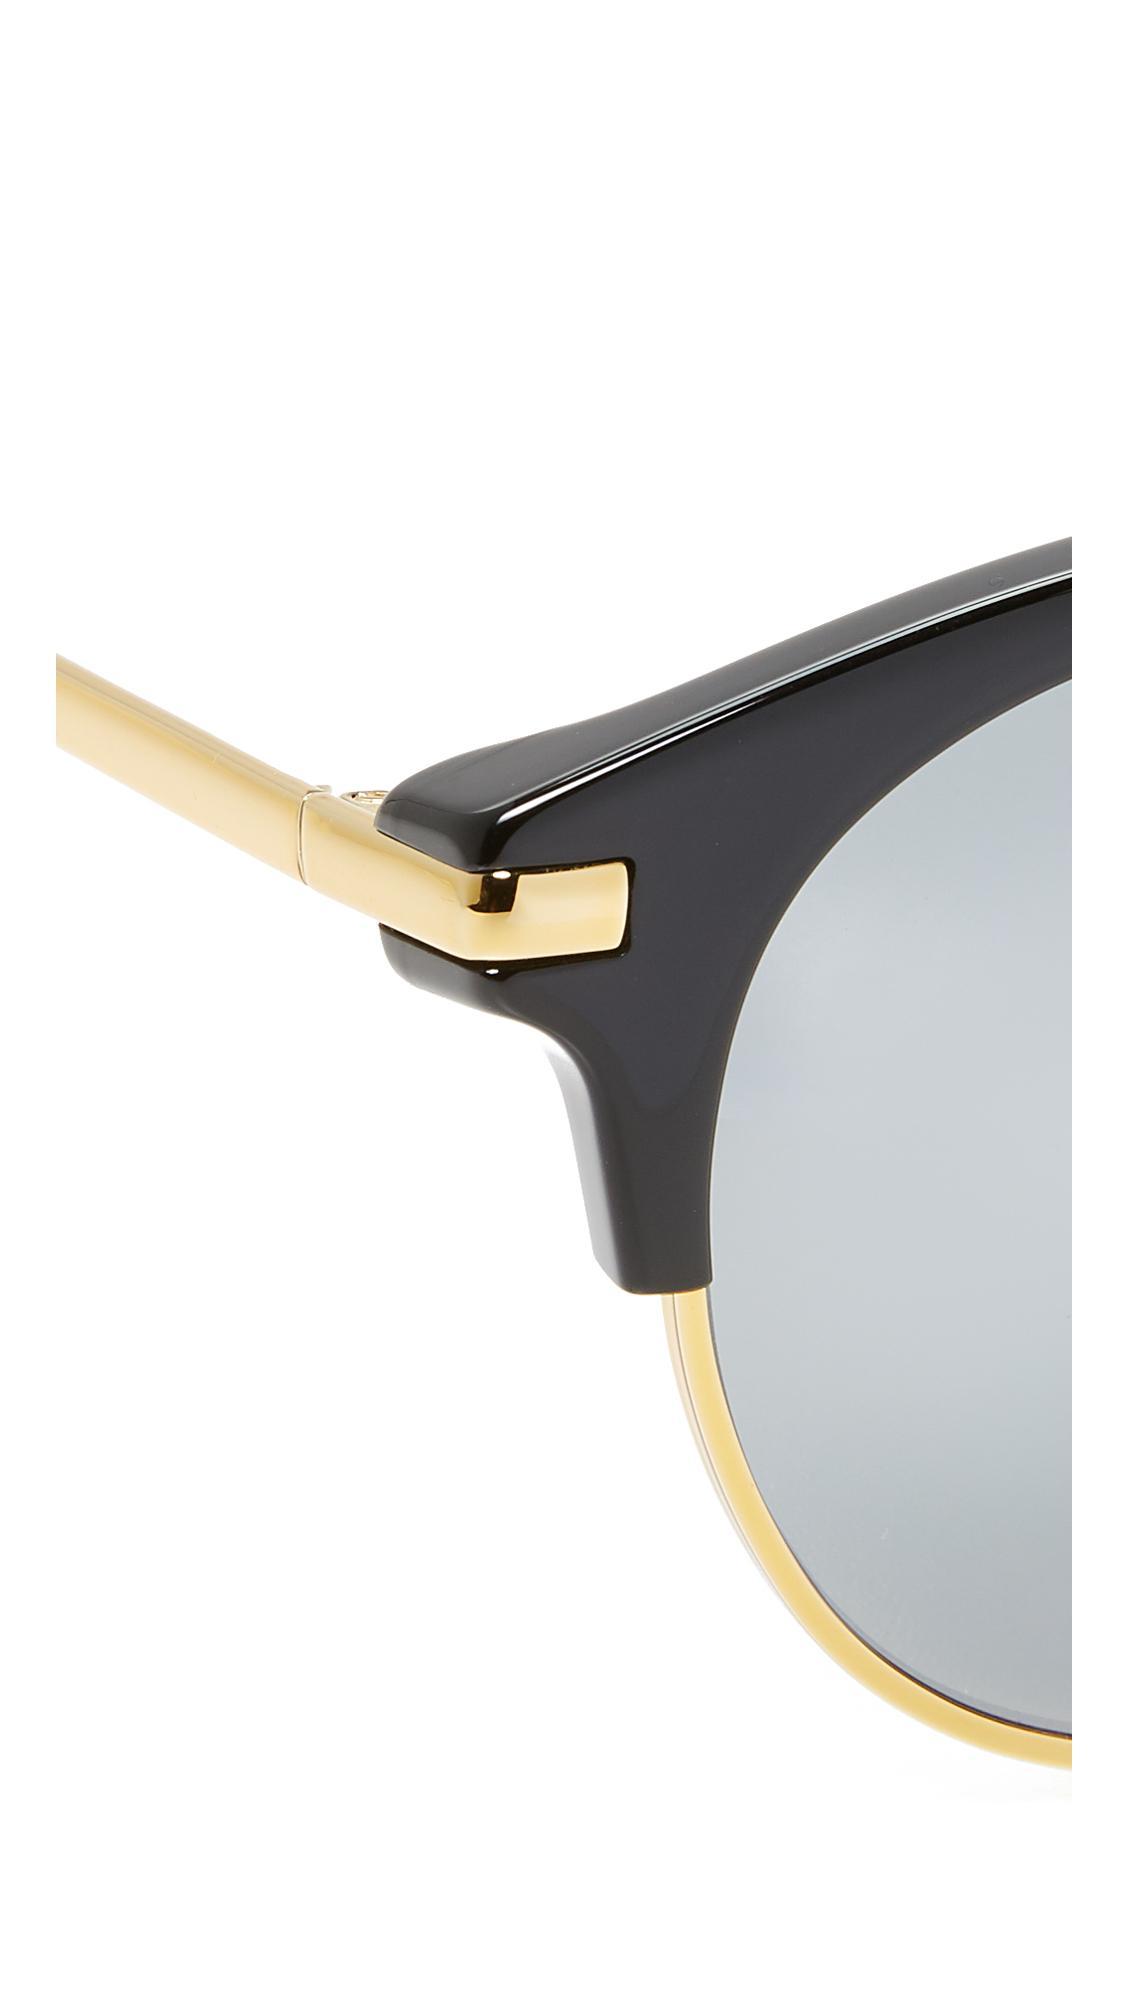 Vedi Vero Round Combo Sunglasses in Black/Black (Black)